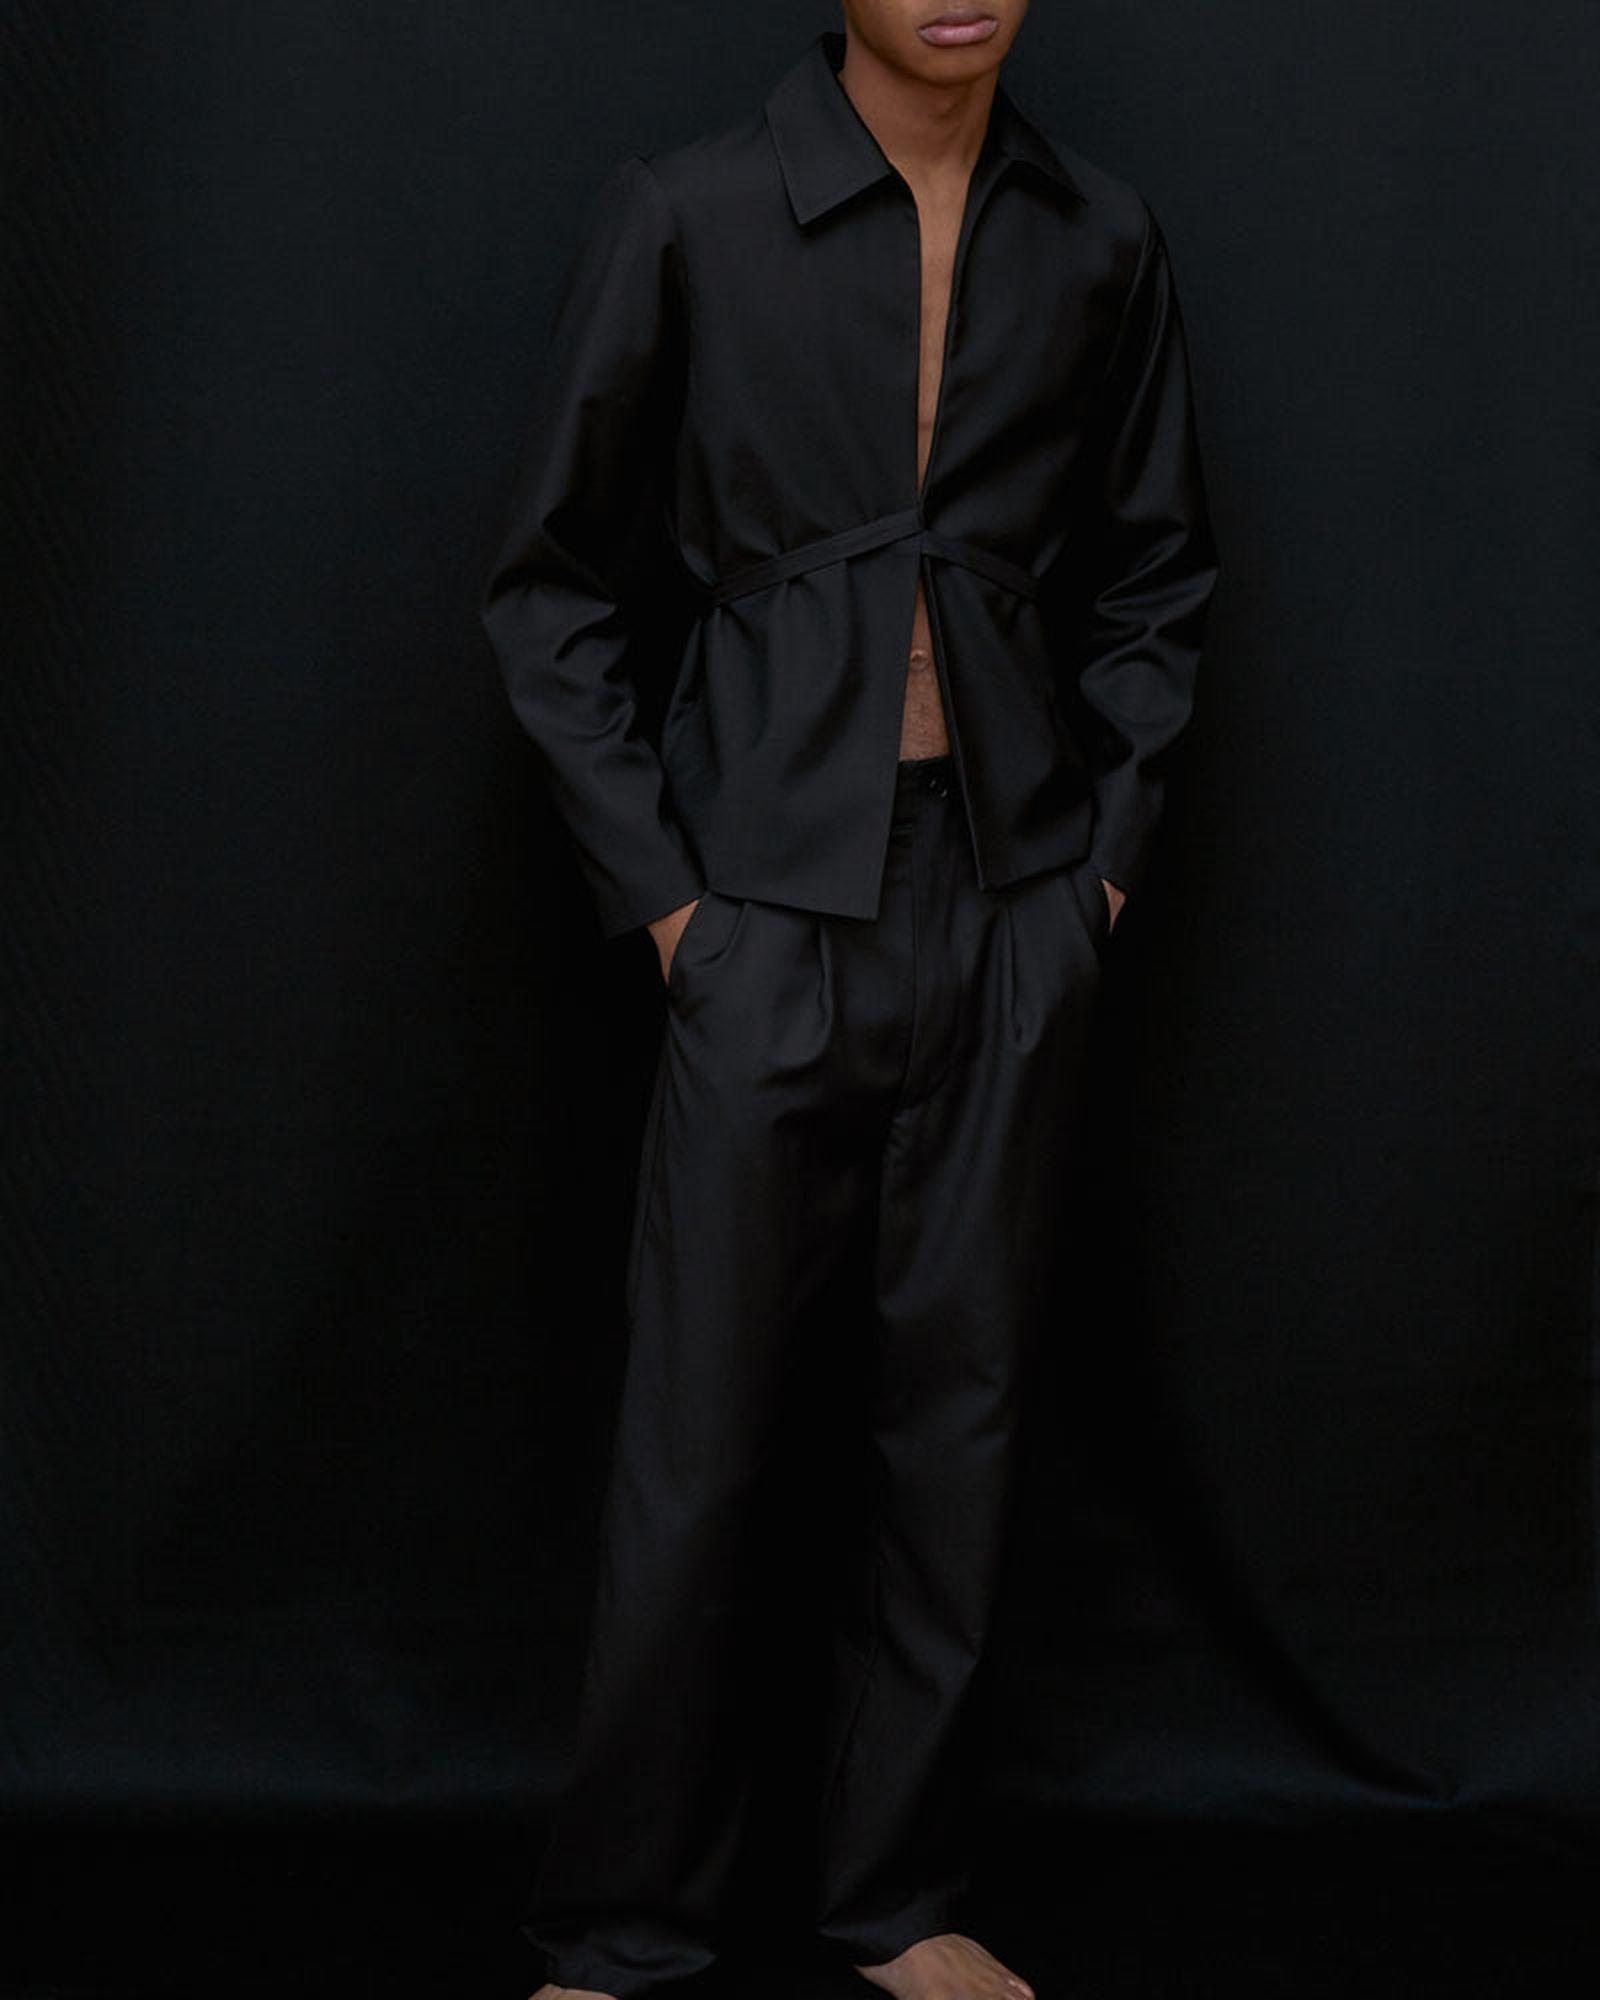 12one-dna-genderless-suiting-lookbook